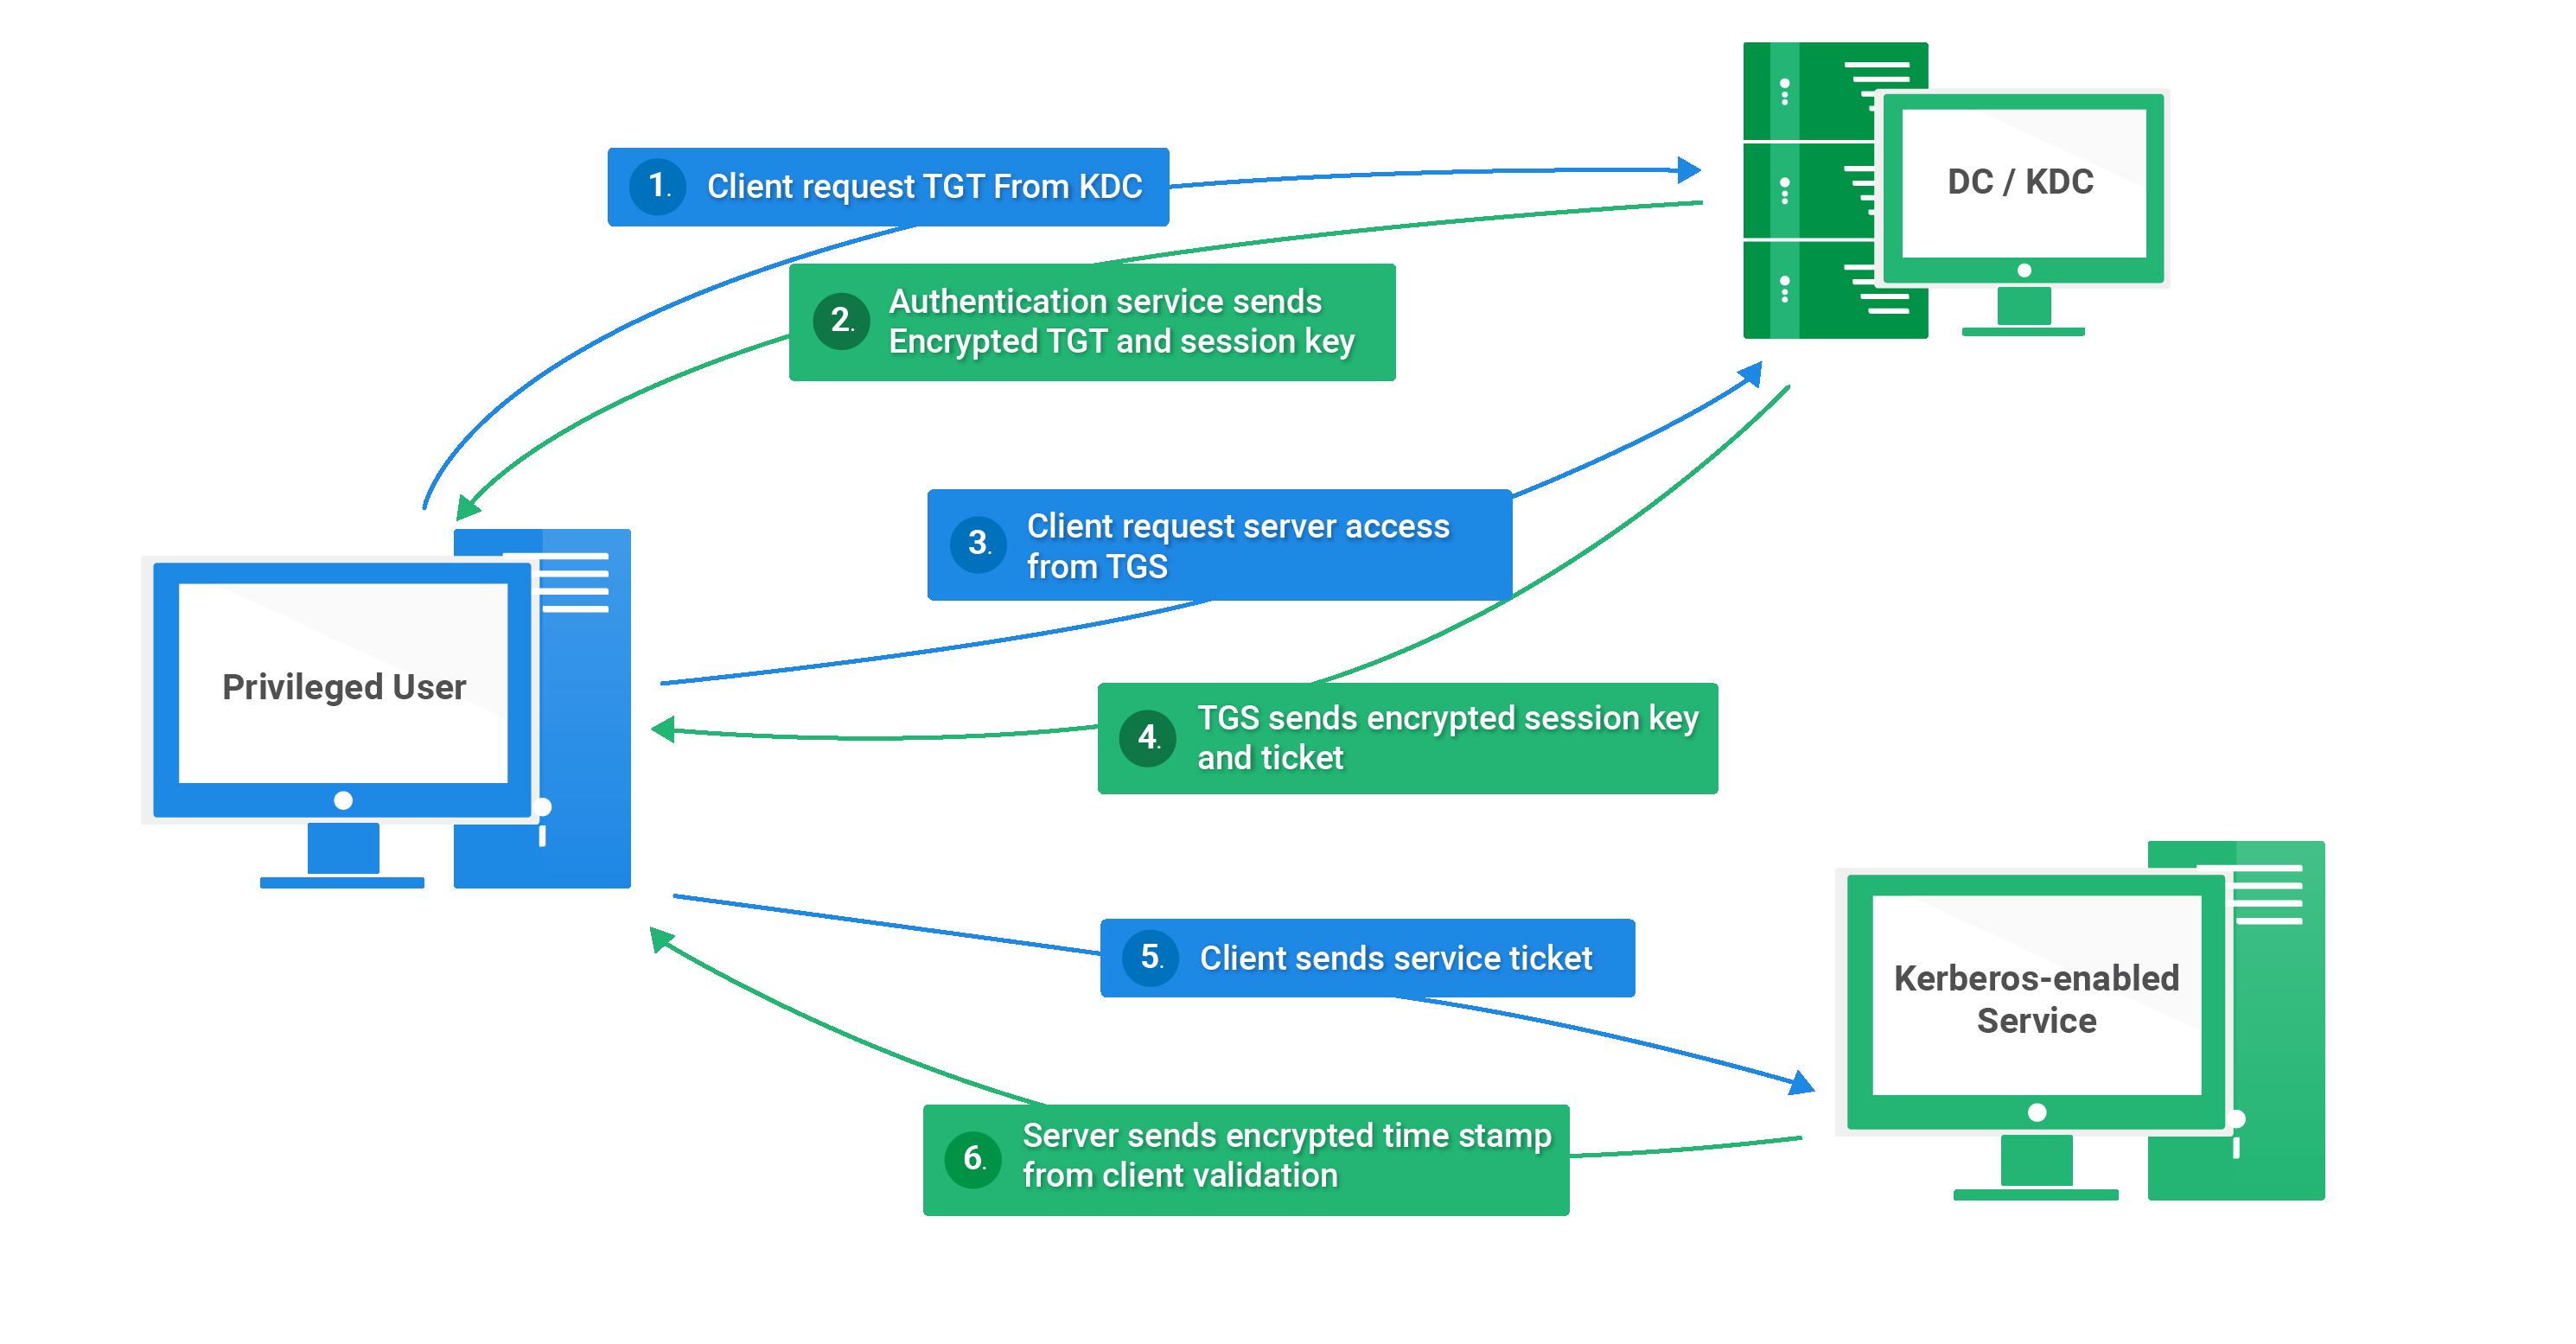 Kerberos Authentication Process and Ticket Exchanges Diagram